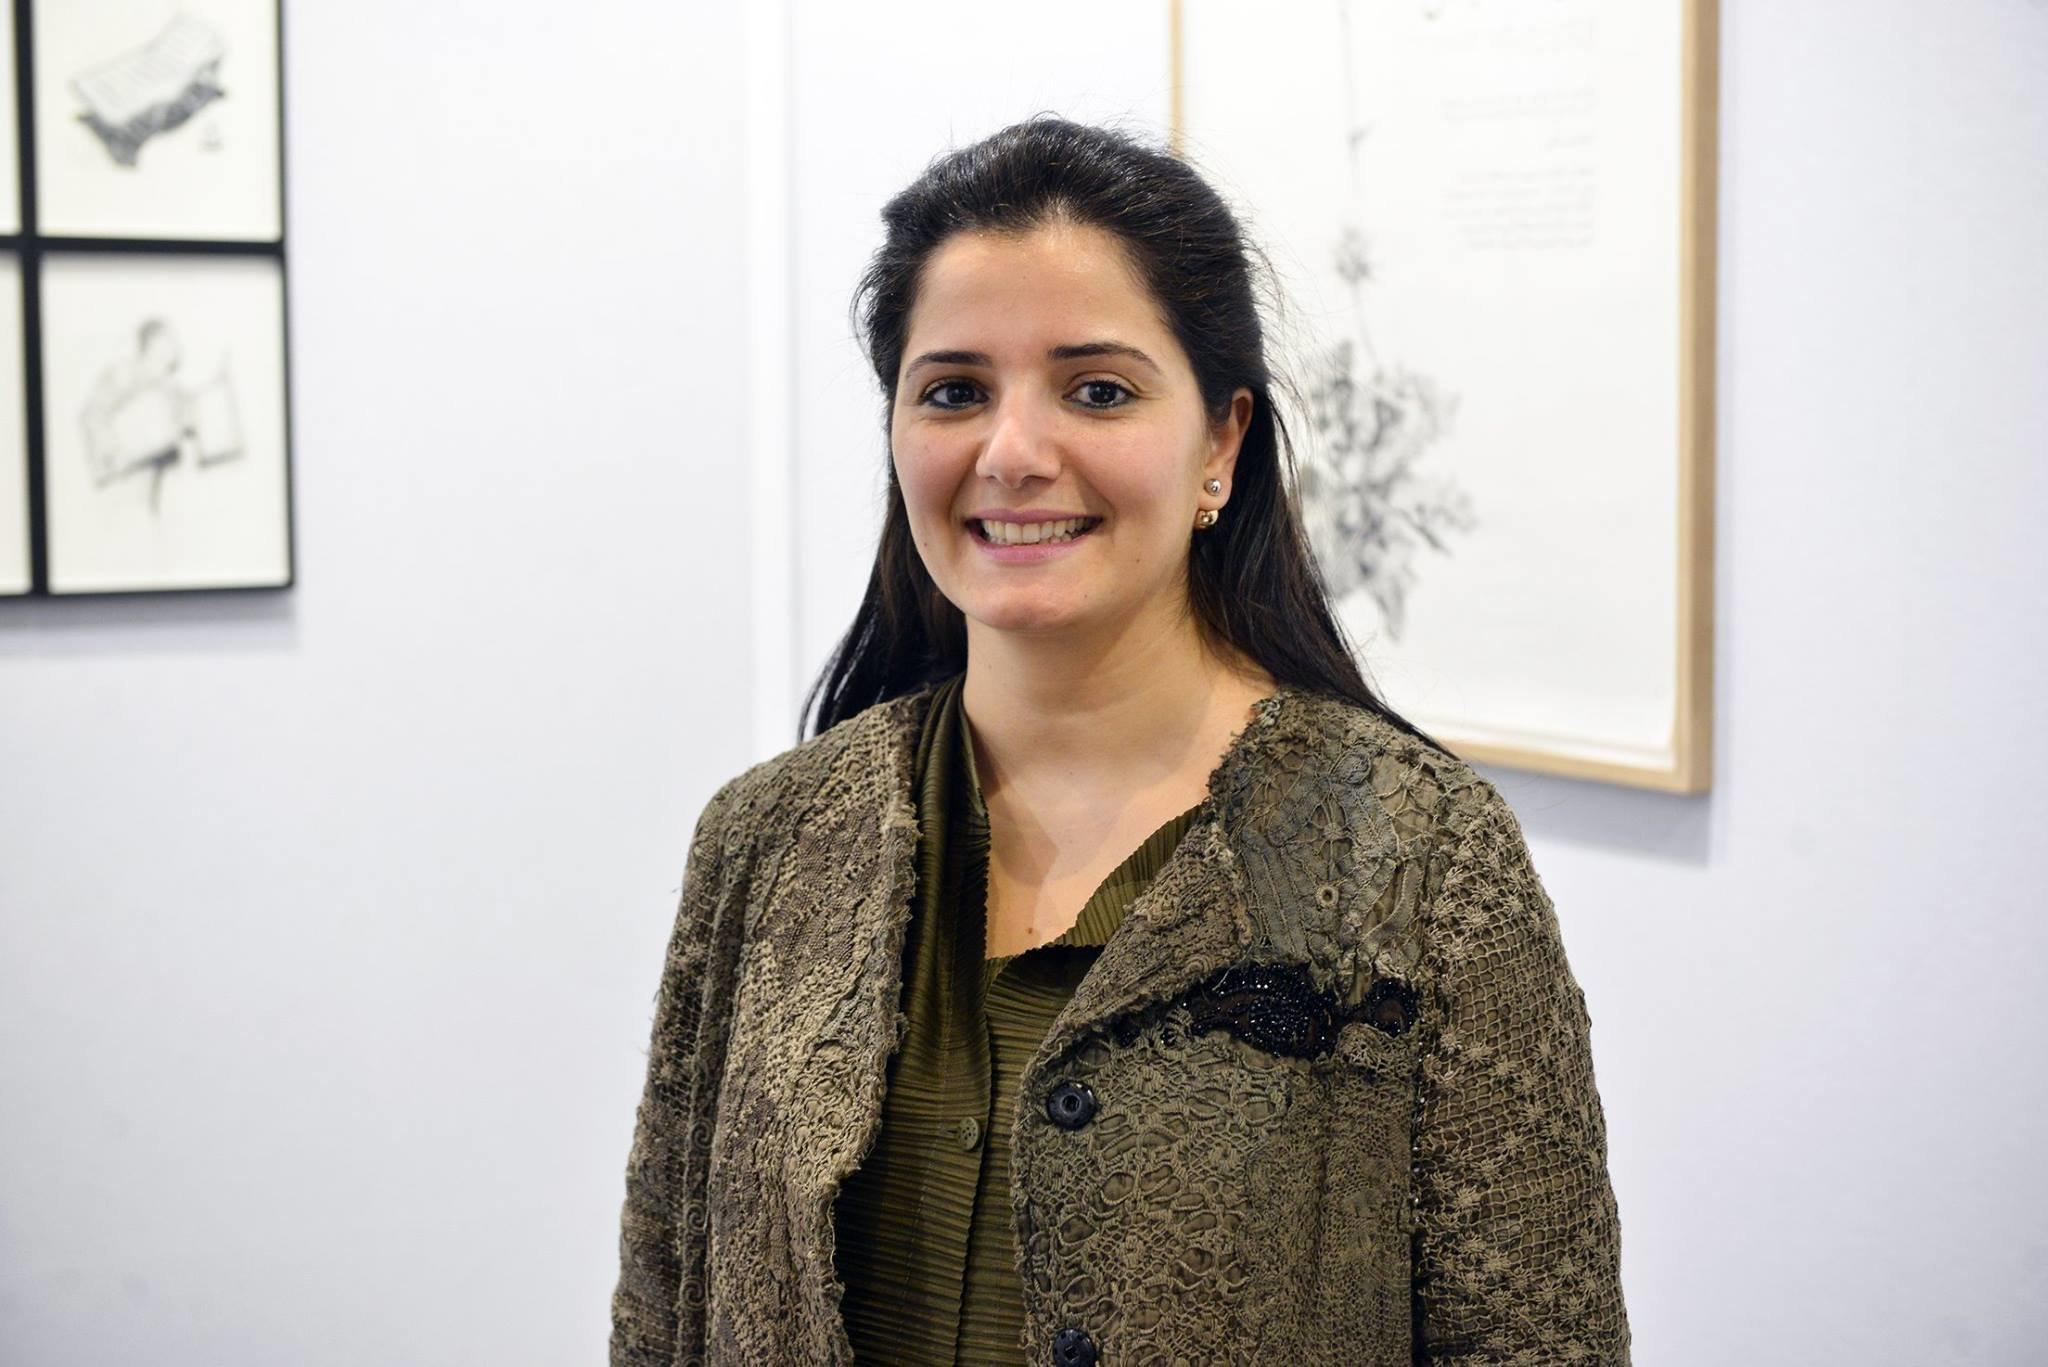 La galeriste tunisienne Selma Feriani présentée par le New York